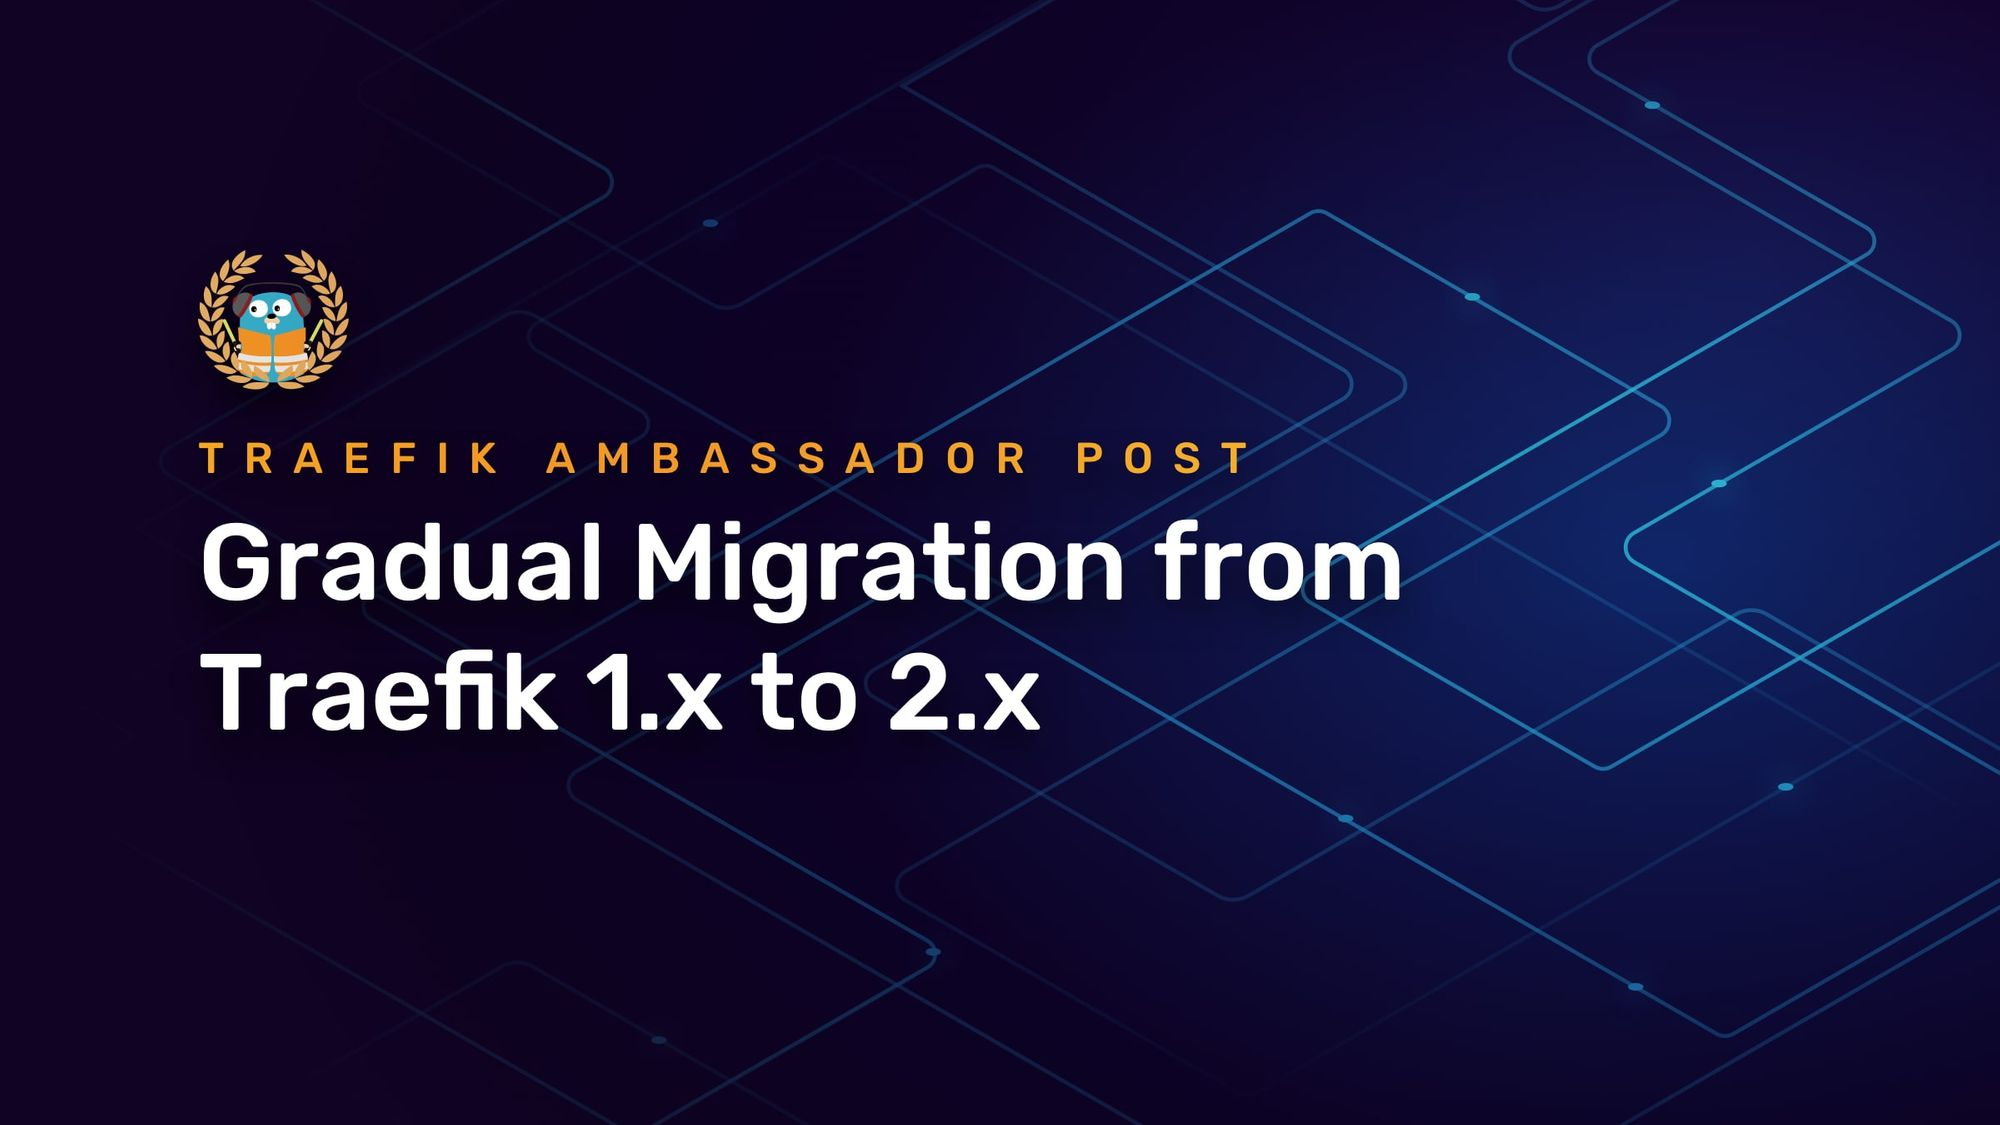 Gradual Migration from Traefik 1.x to 2.x